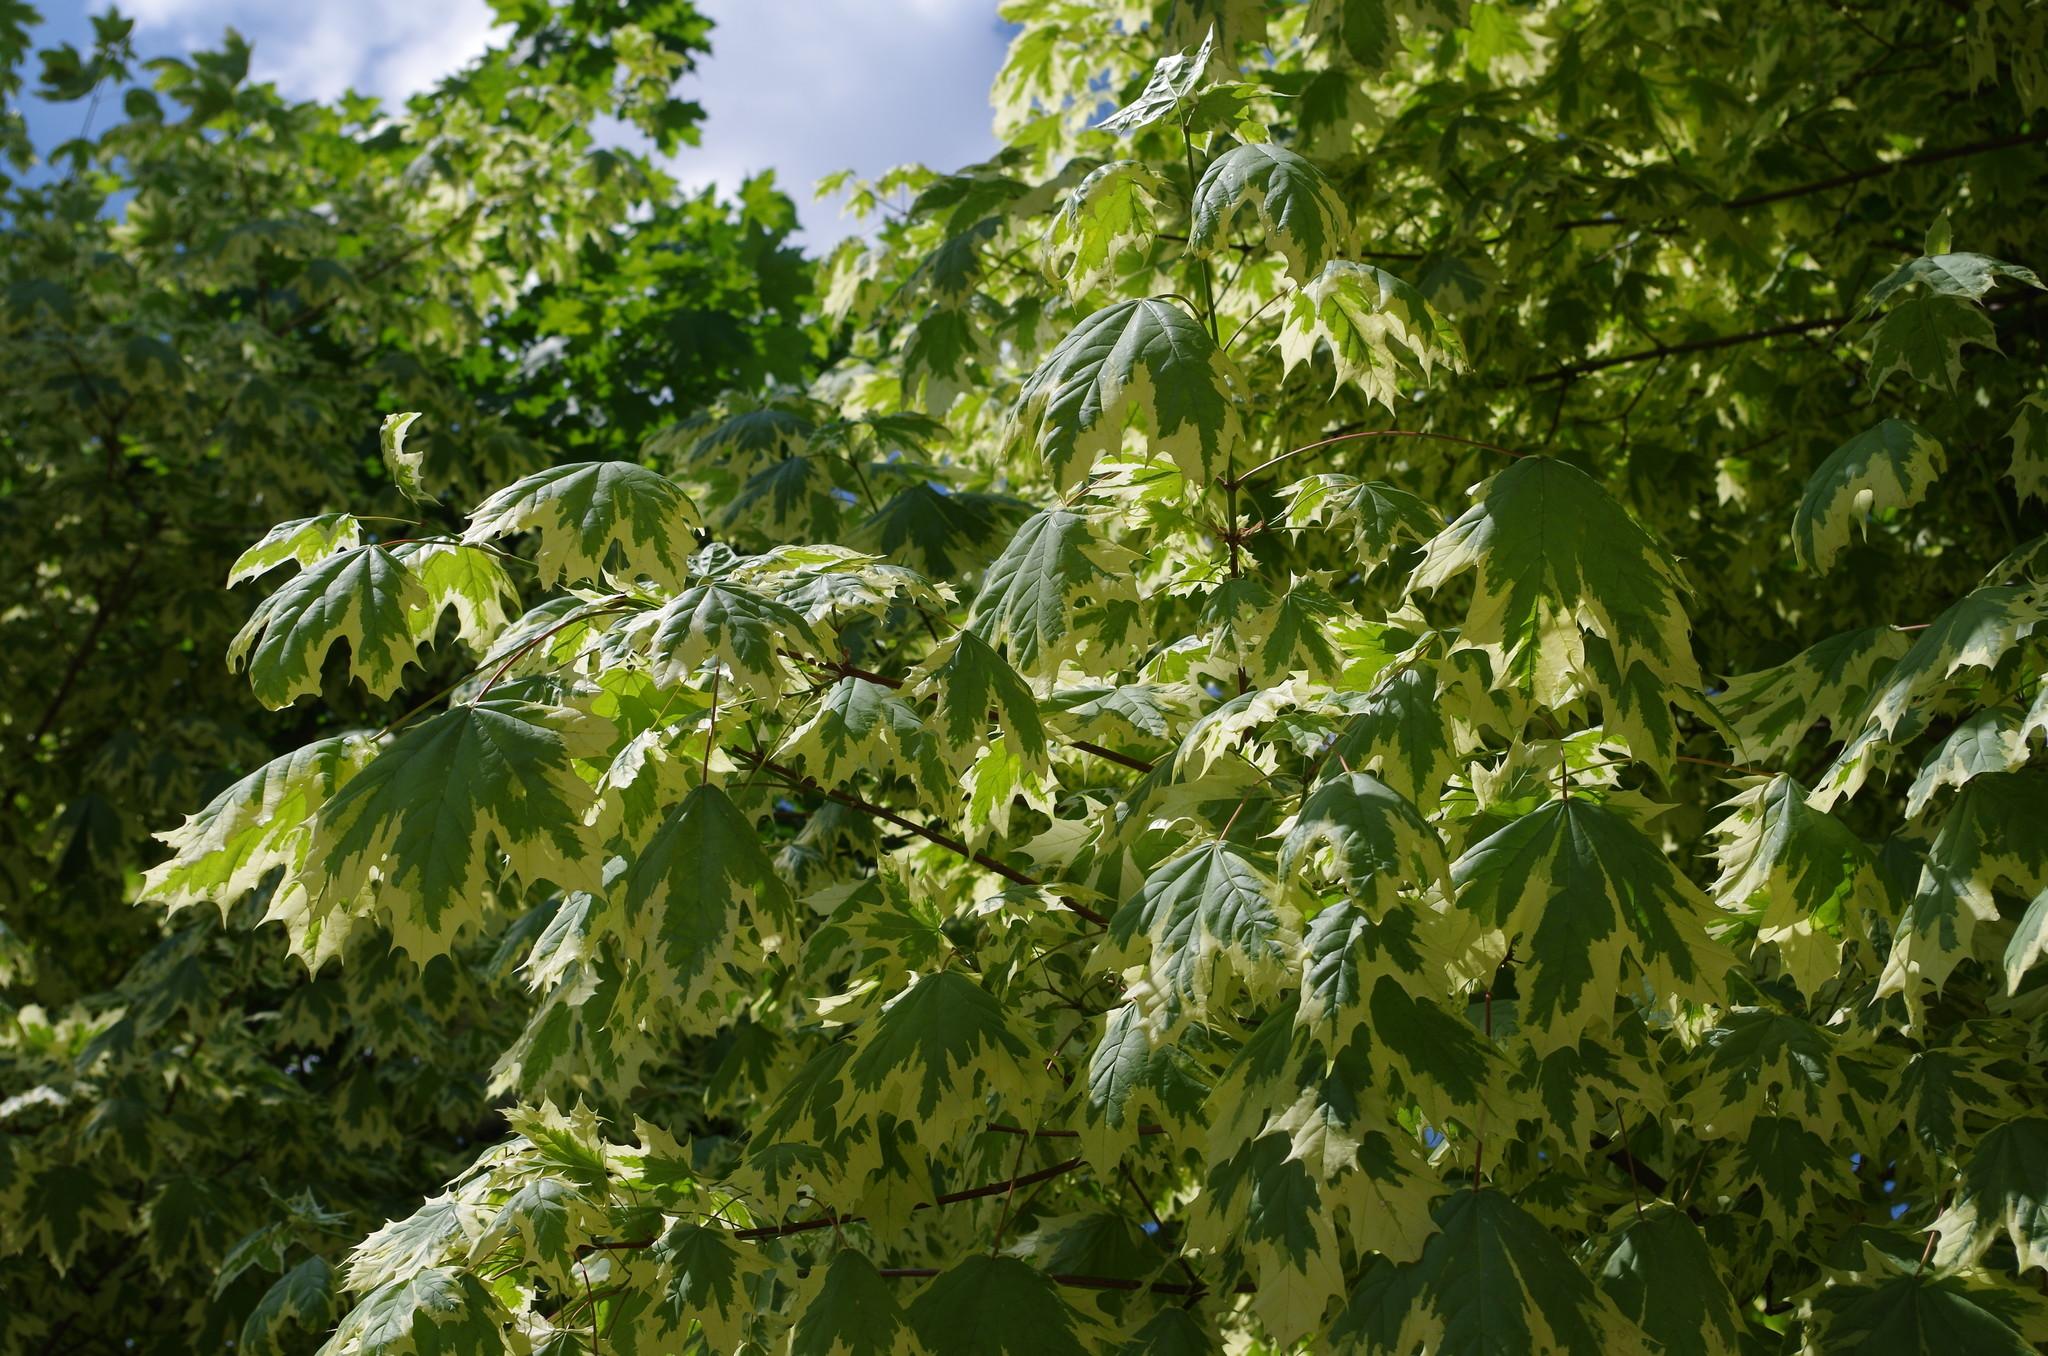 Клён остролистный Друммонди (Acer platanoides Drummondii)